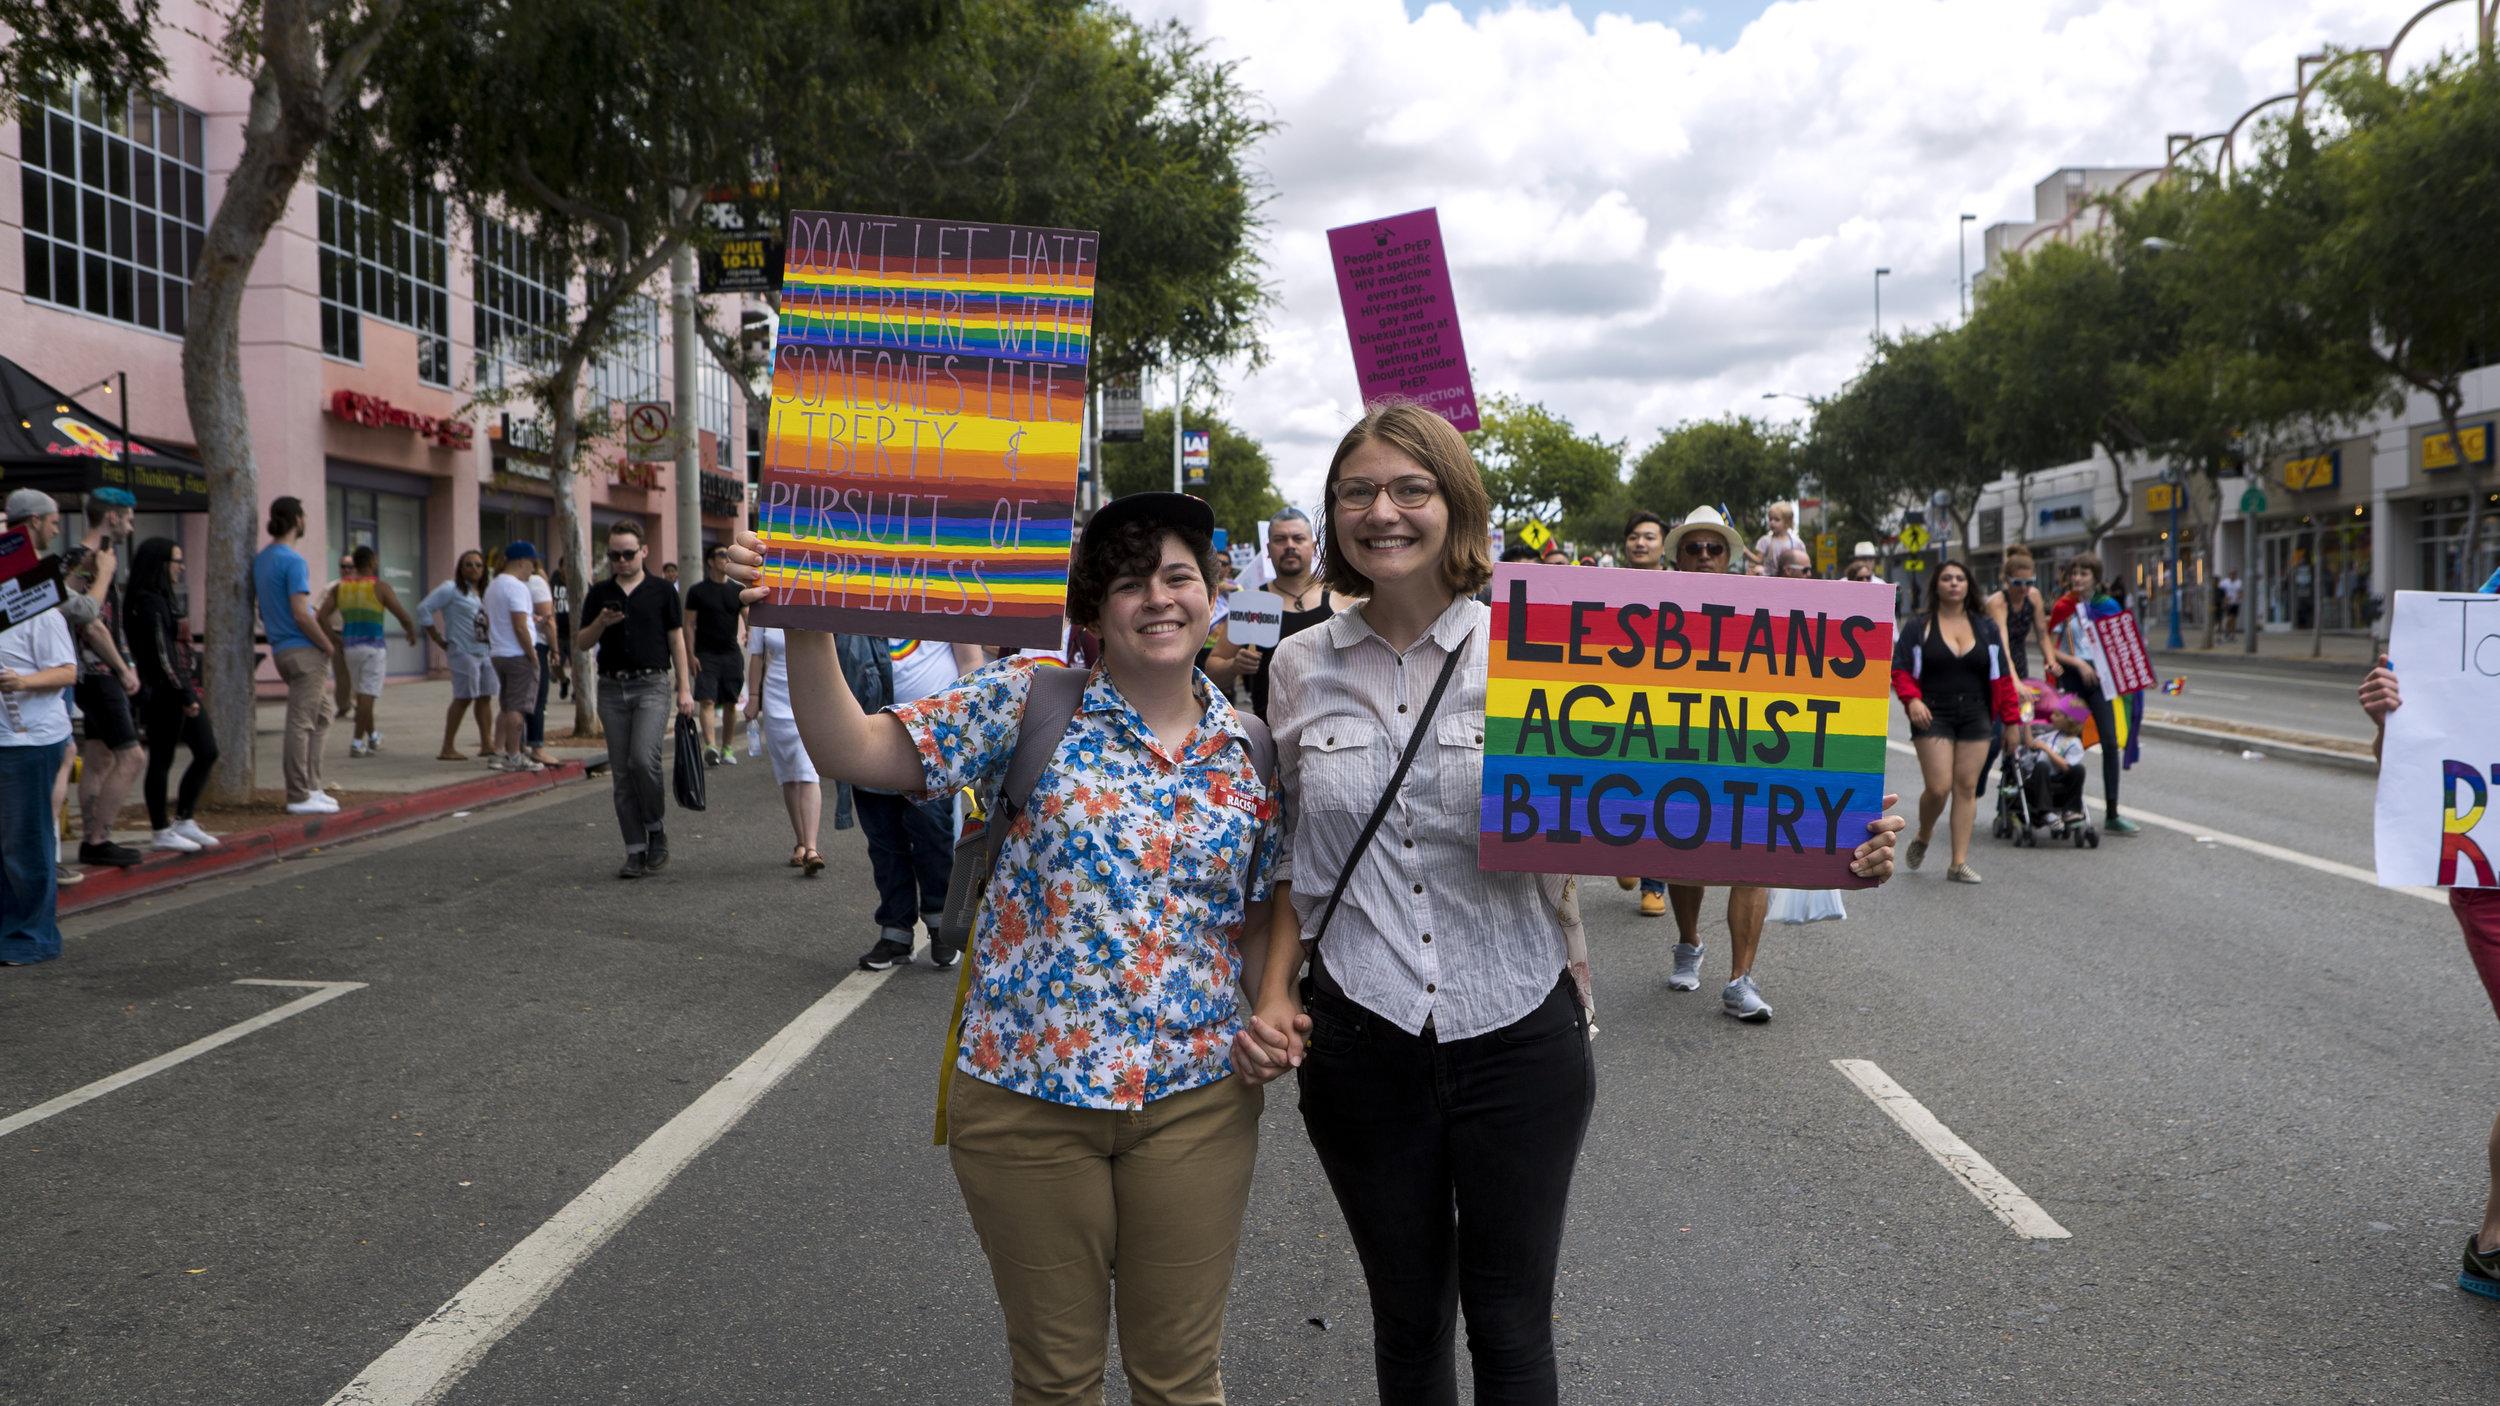 Against Bigotry